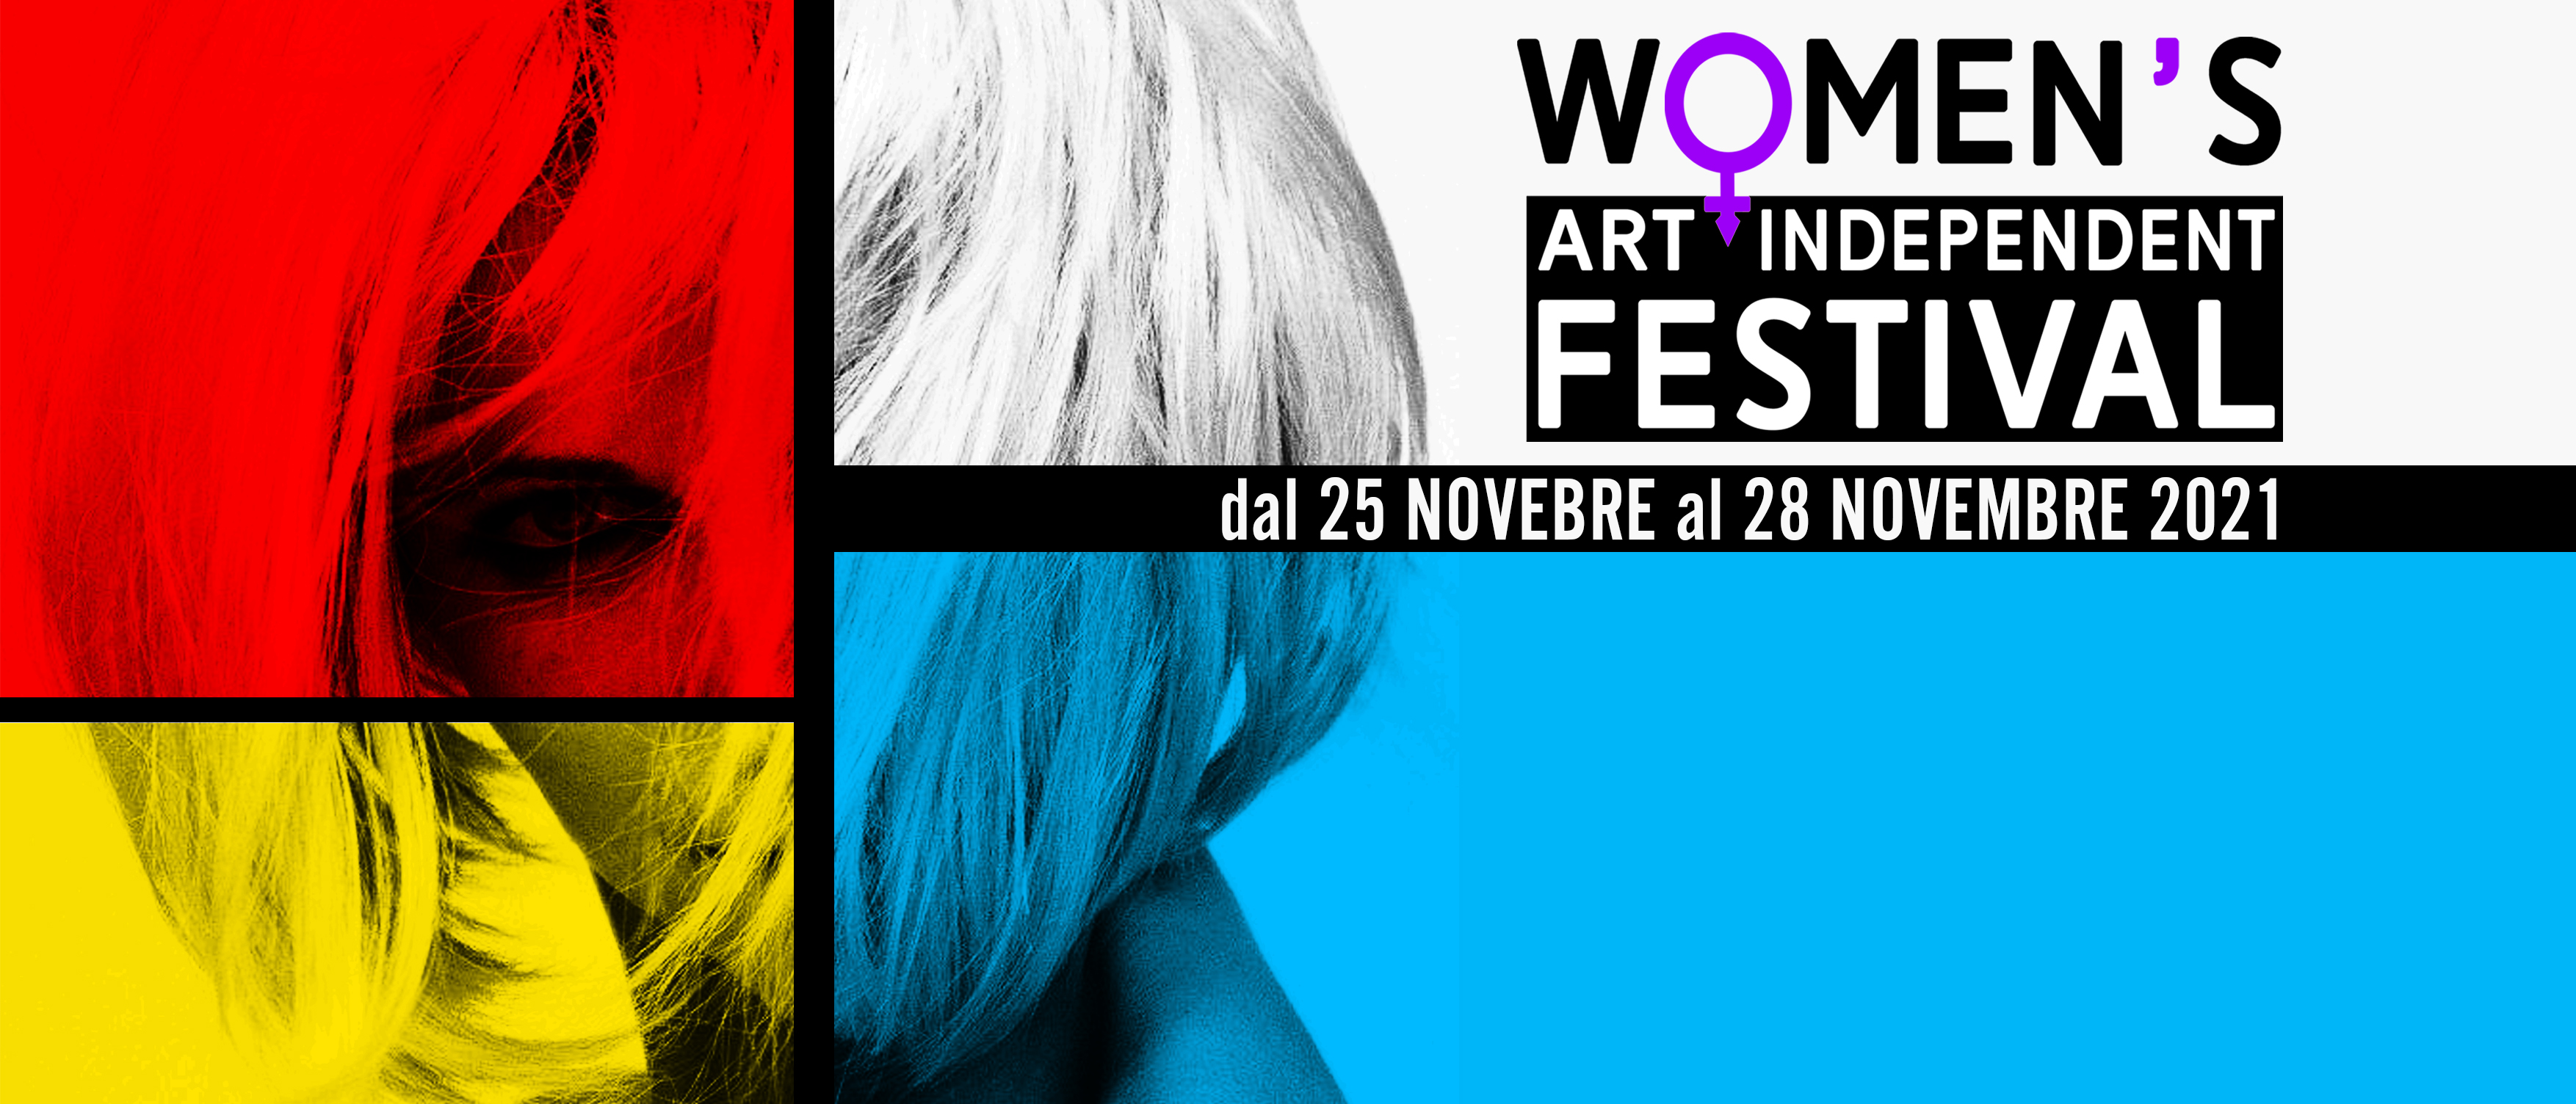 Women's Art Independent Festival